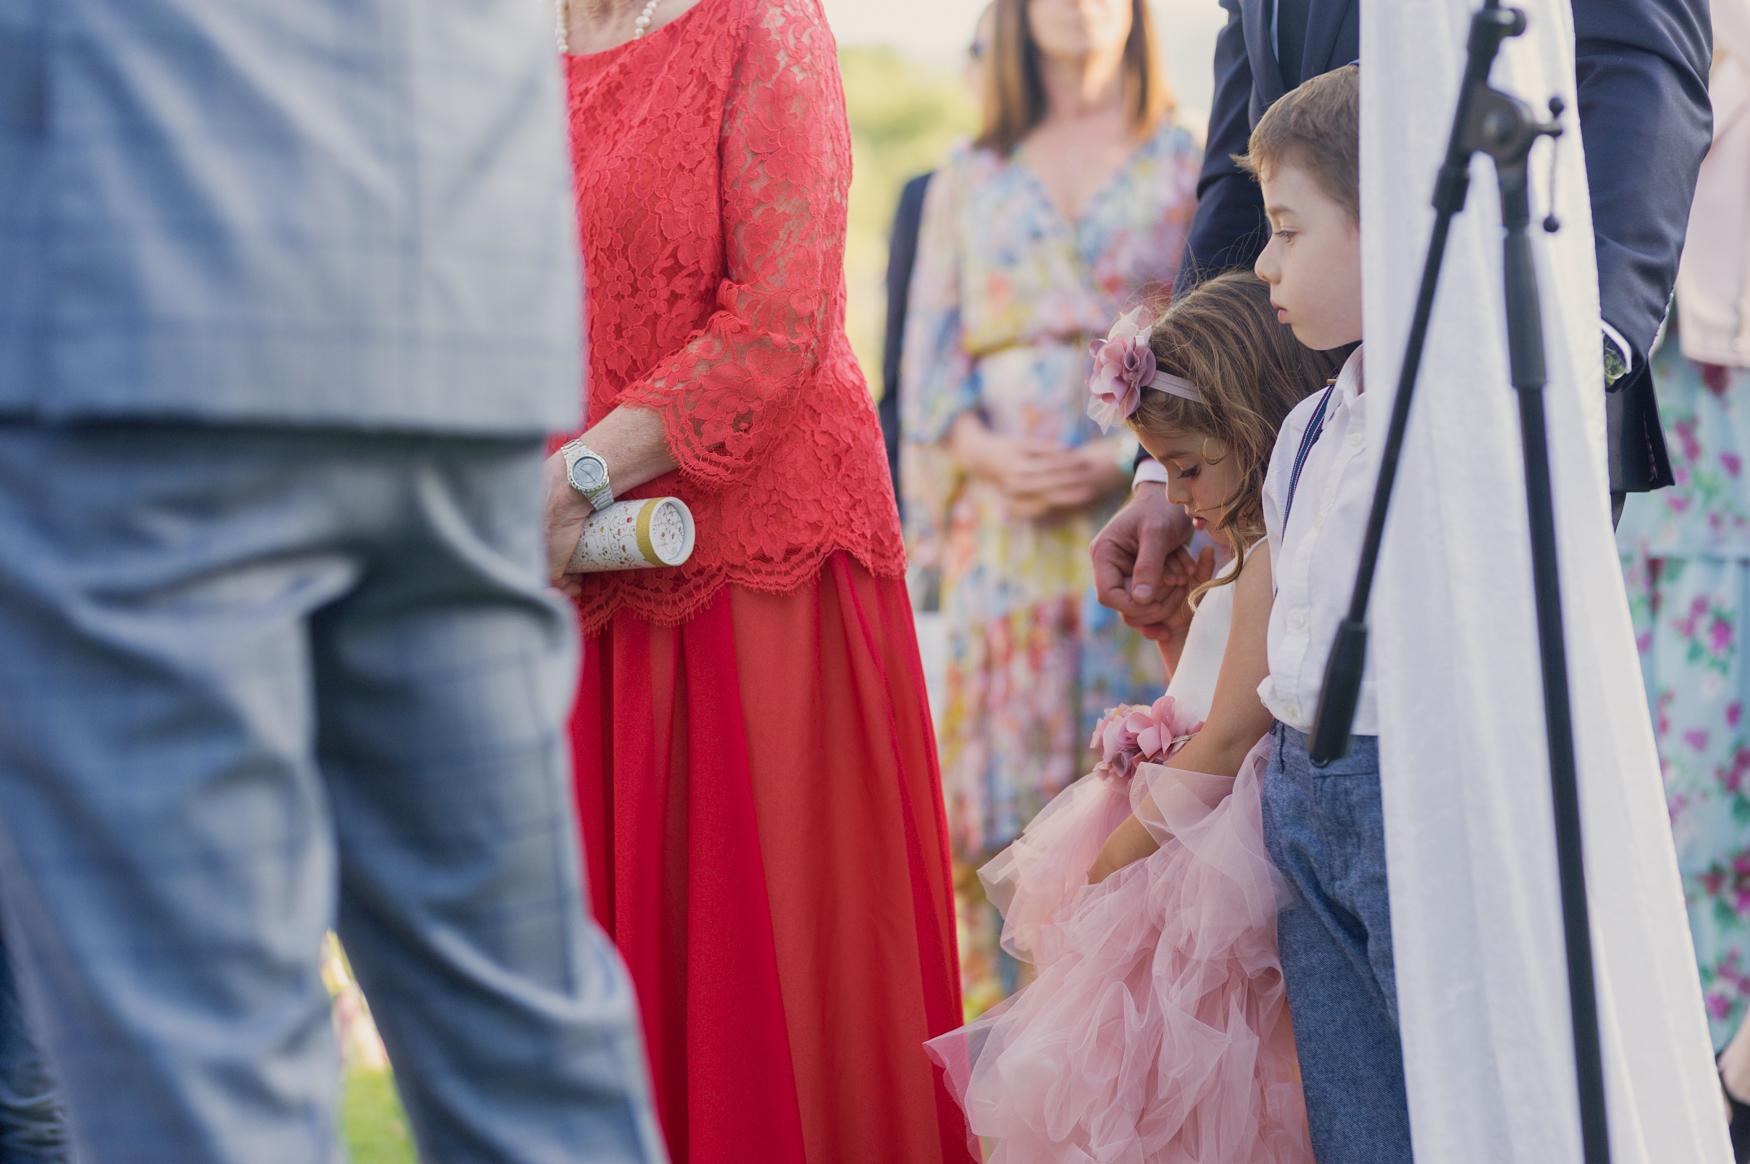 Leon_&_Martine's_Wedding_Photographs_17th_April_2019_@johnhenryweddingphoto_Low_Resolution_Web-330.JPG